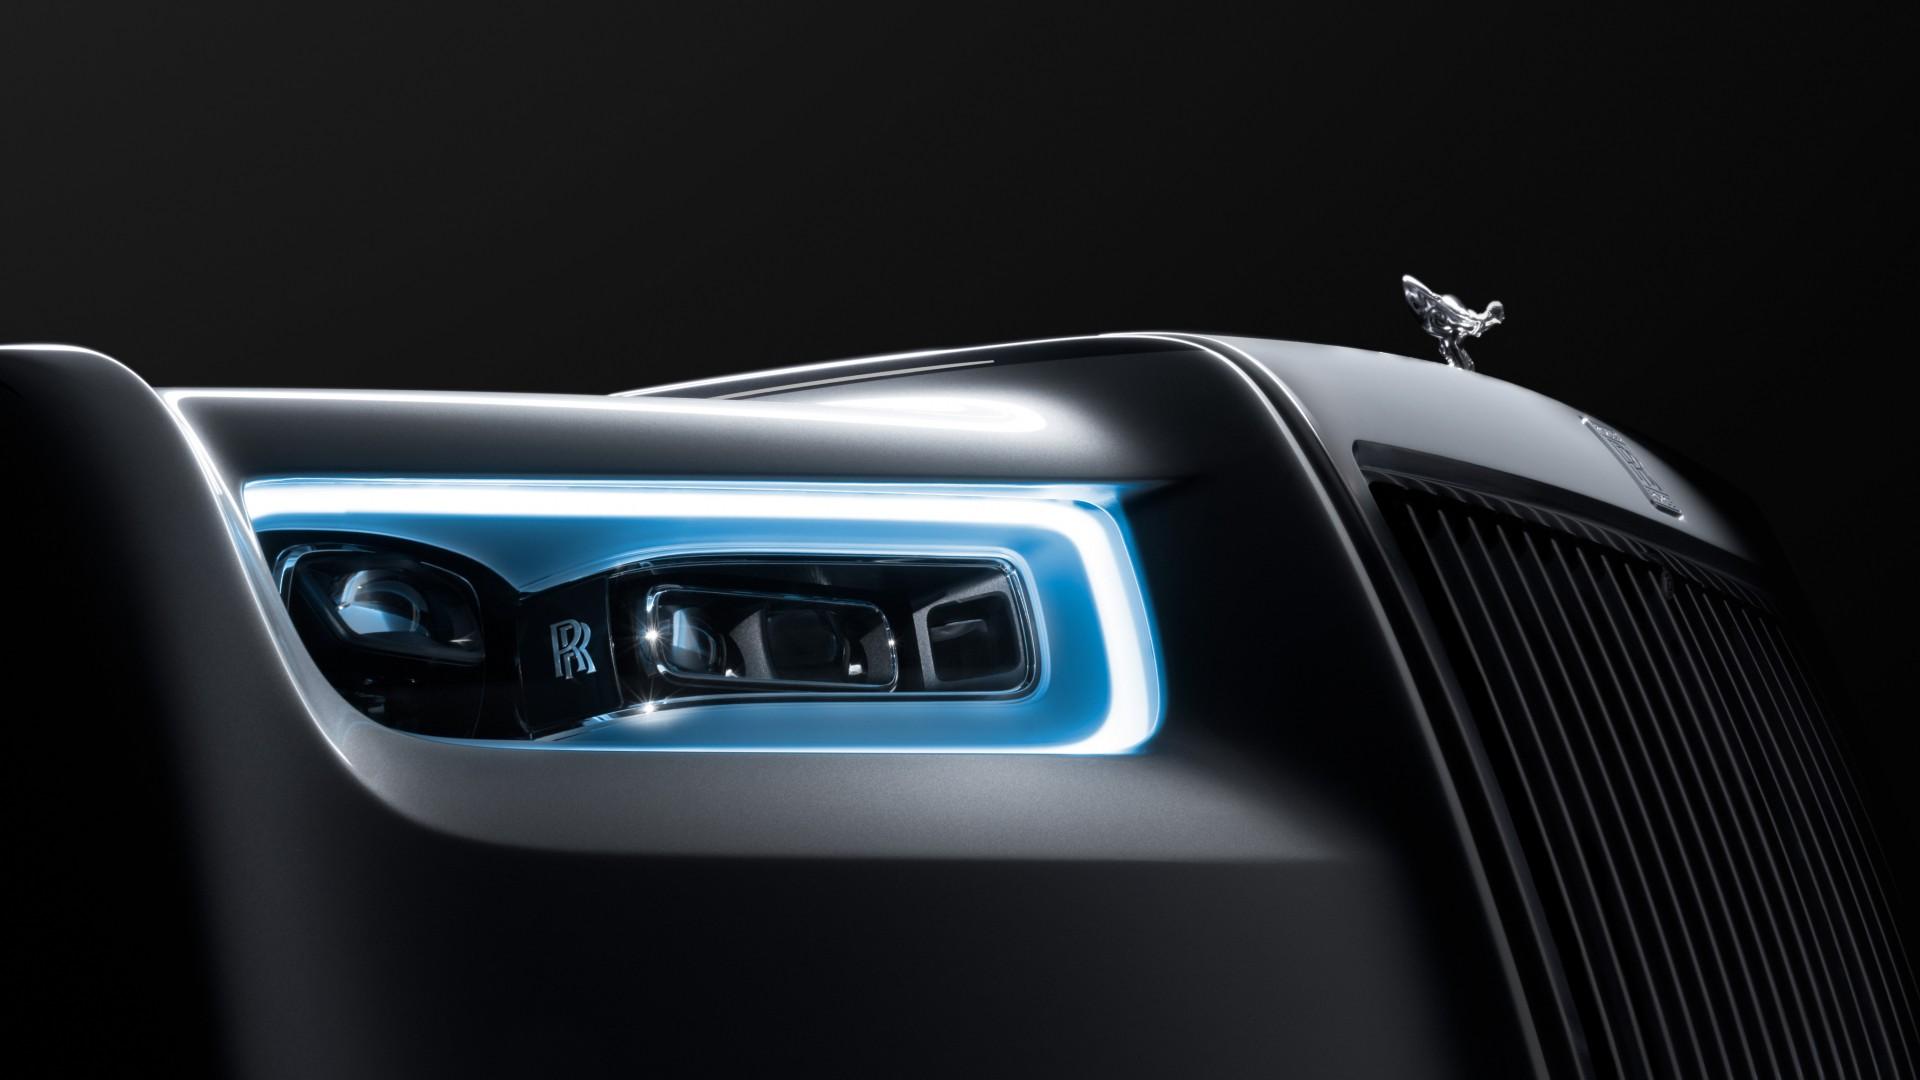 Phantom Car Wallpaper 2017 Rolls Royce Phantom 5 Wallpaper Hd Car Wallpapers